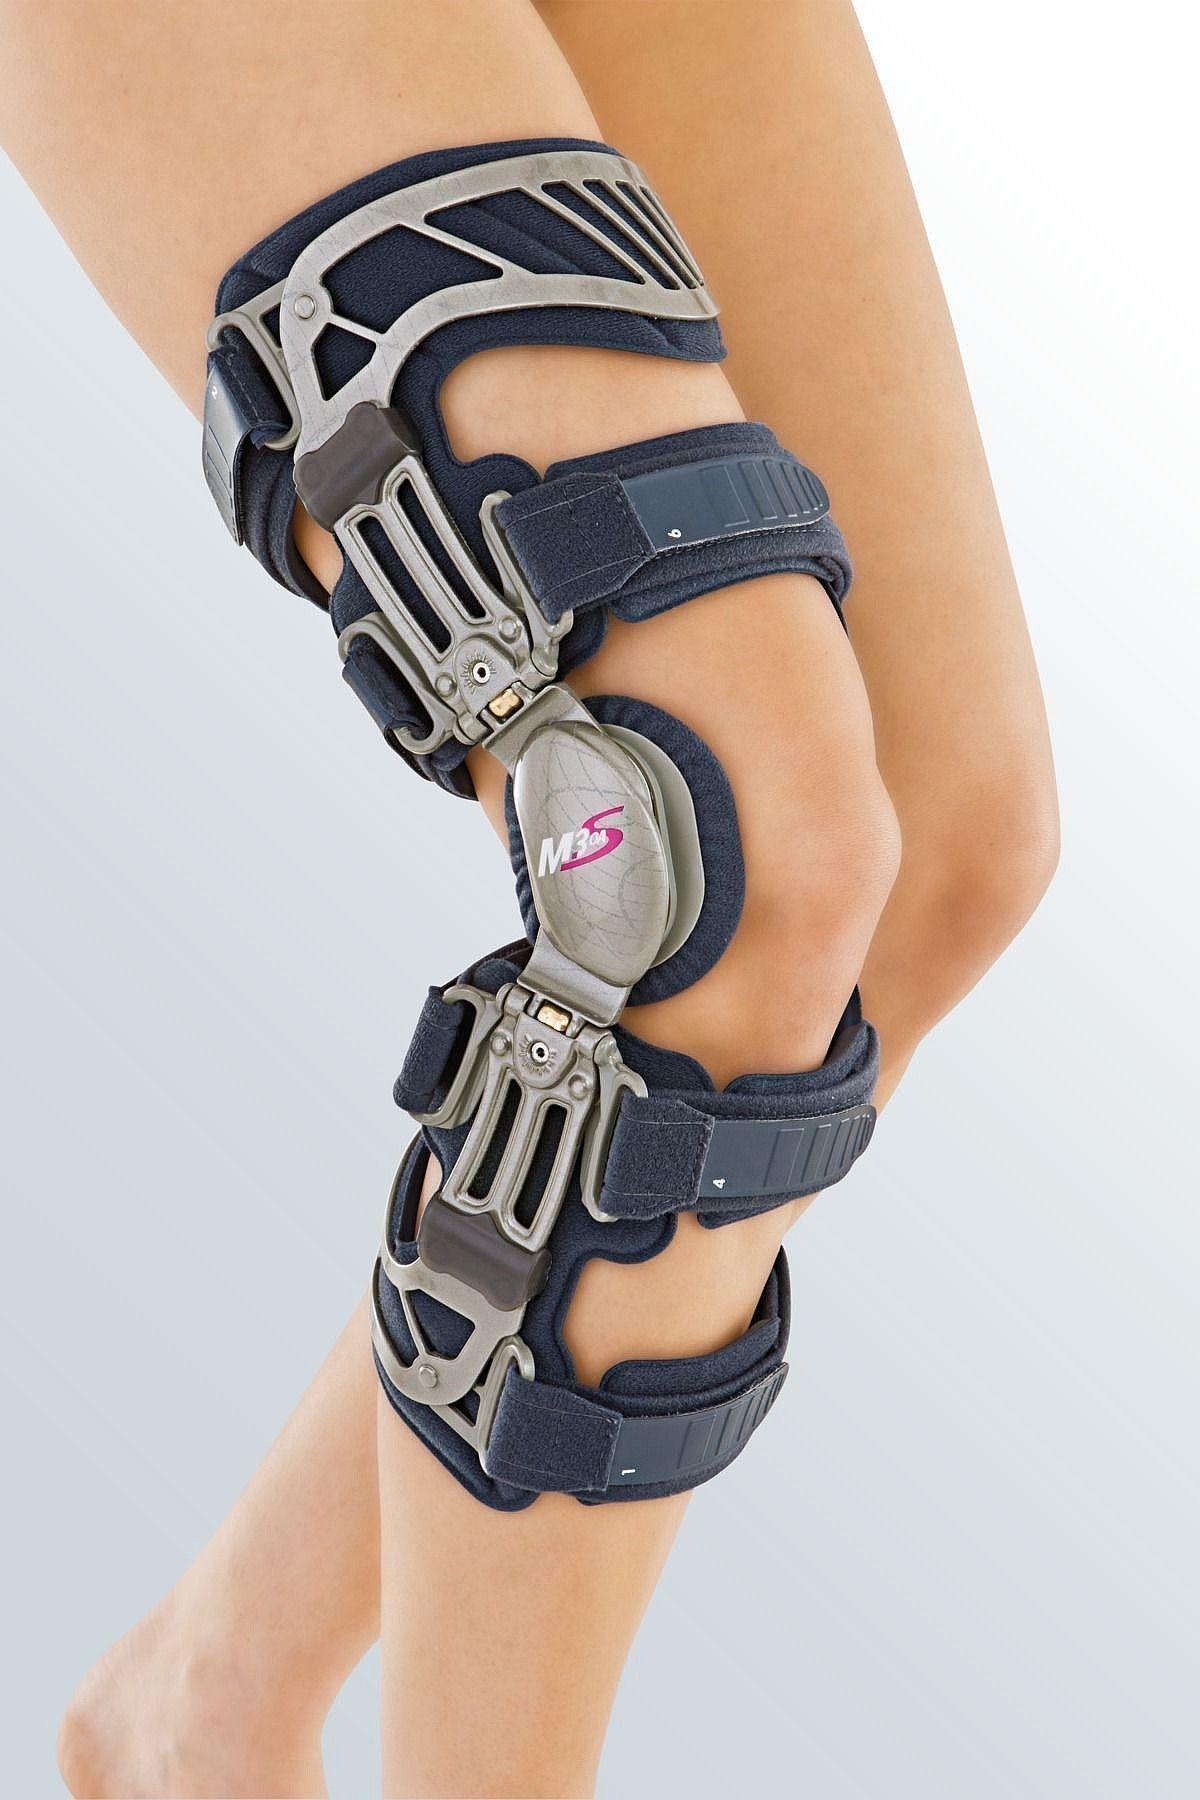 m 3 u00aes oa single hinged functional knee brace from medi